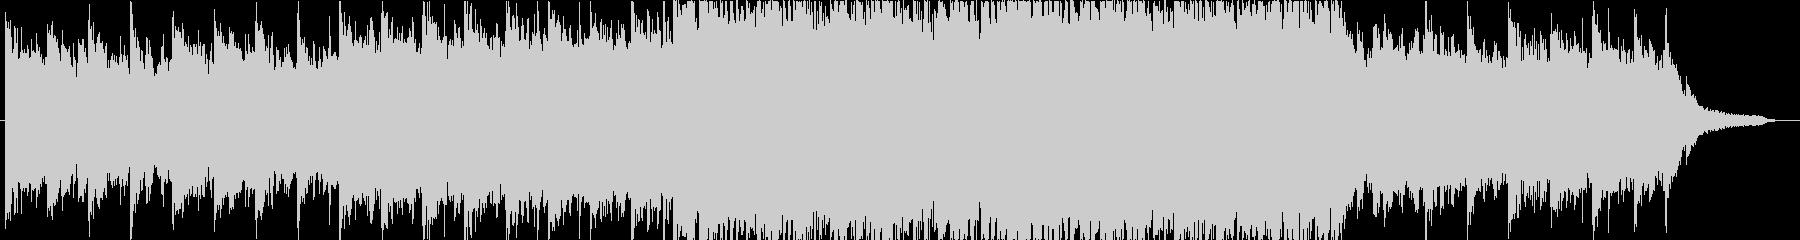 【BGM】和風なFuturepopの未再生の波形